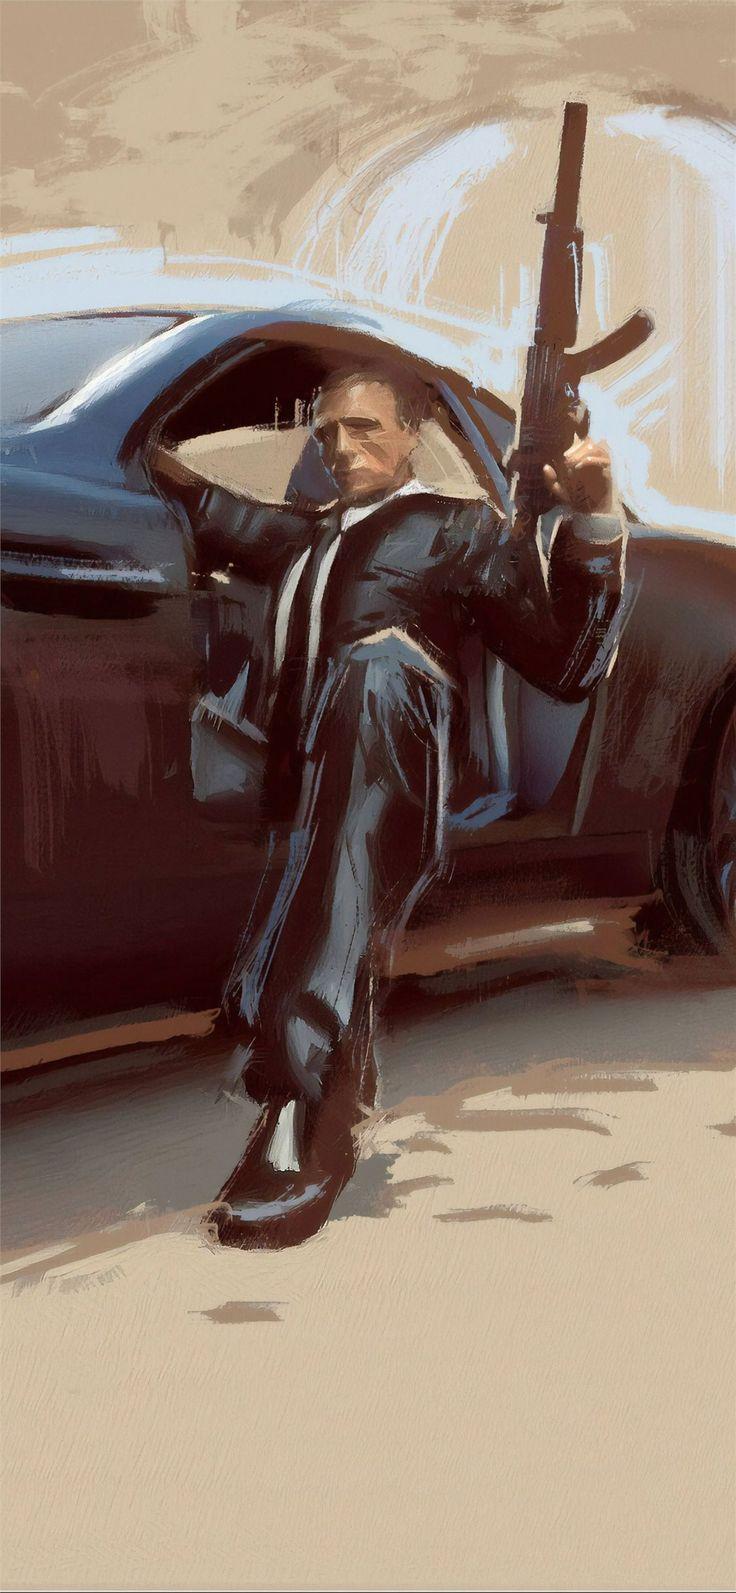 james bond car art in 2020 Bond cars, James bond cars